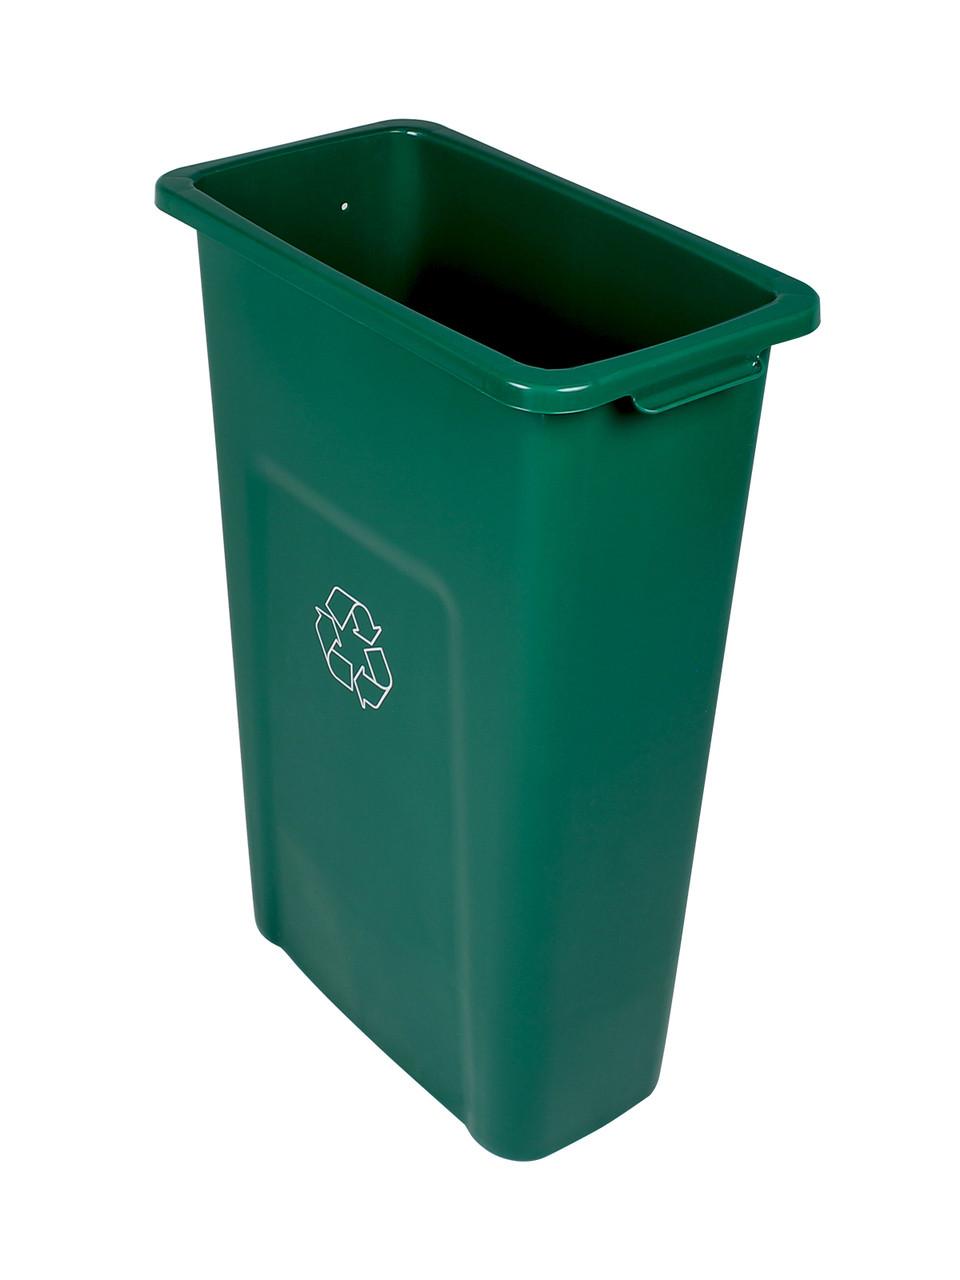 23 Gallon Skinny Plastic Home & Office Recycling Bin Green